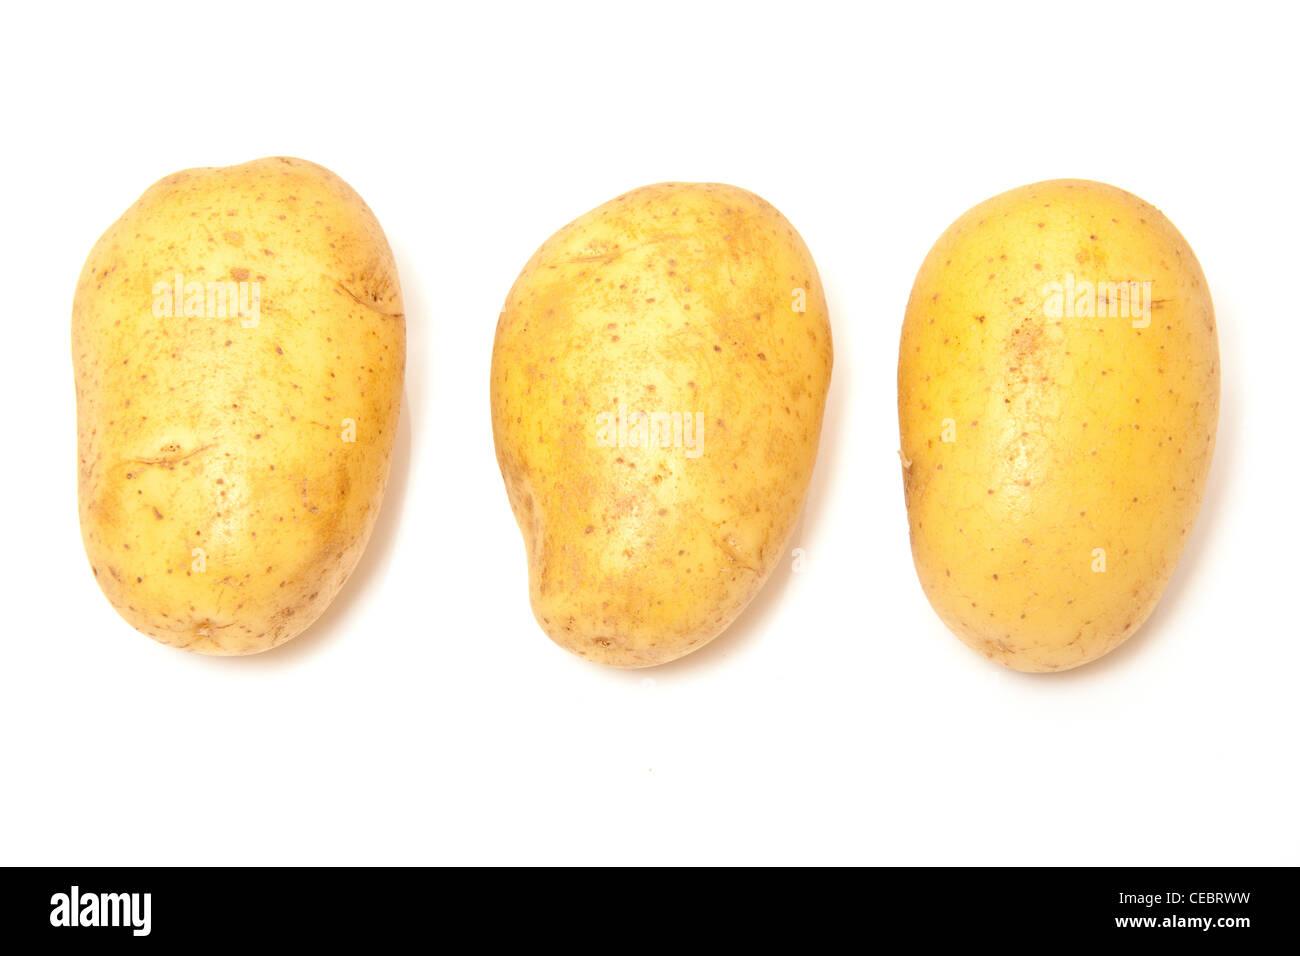 Vivaldi baking potatoes isolated on a white studio background. - Stock Image